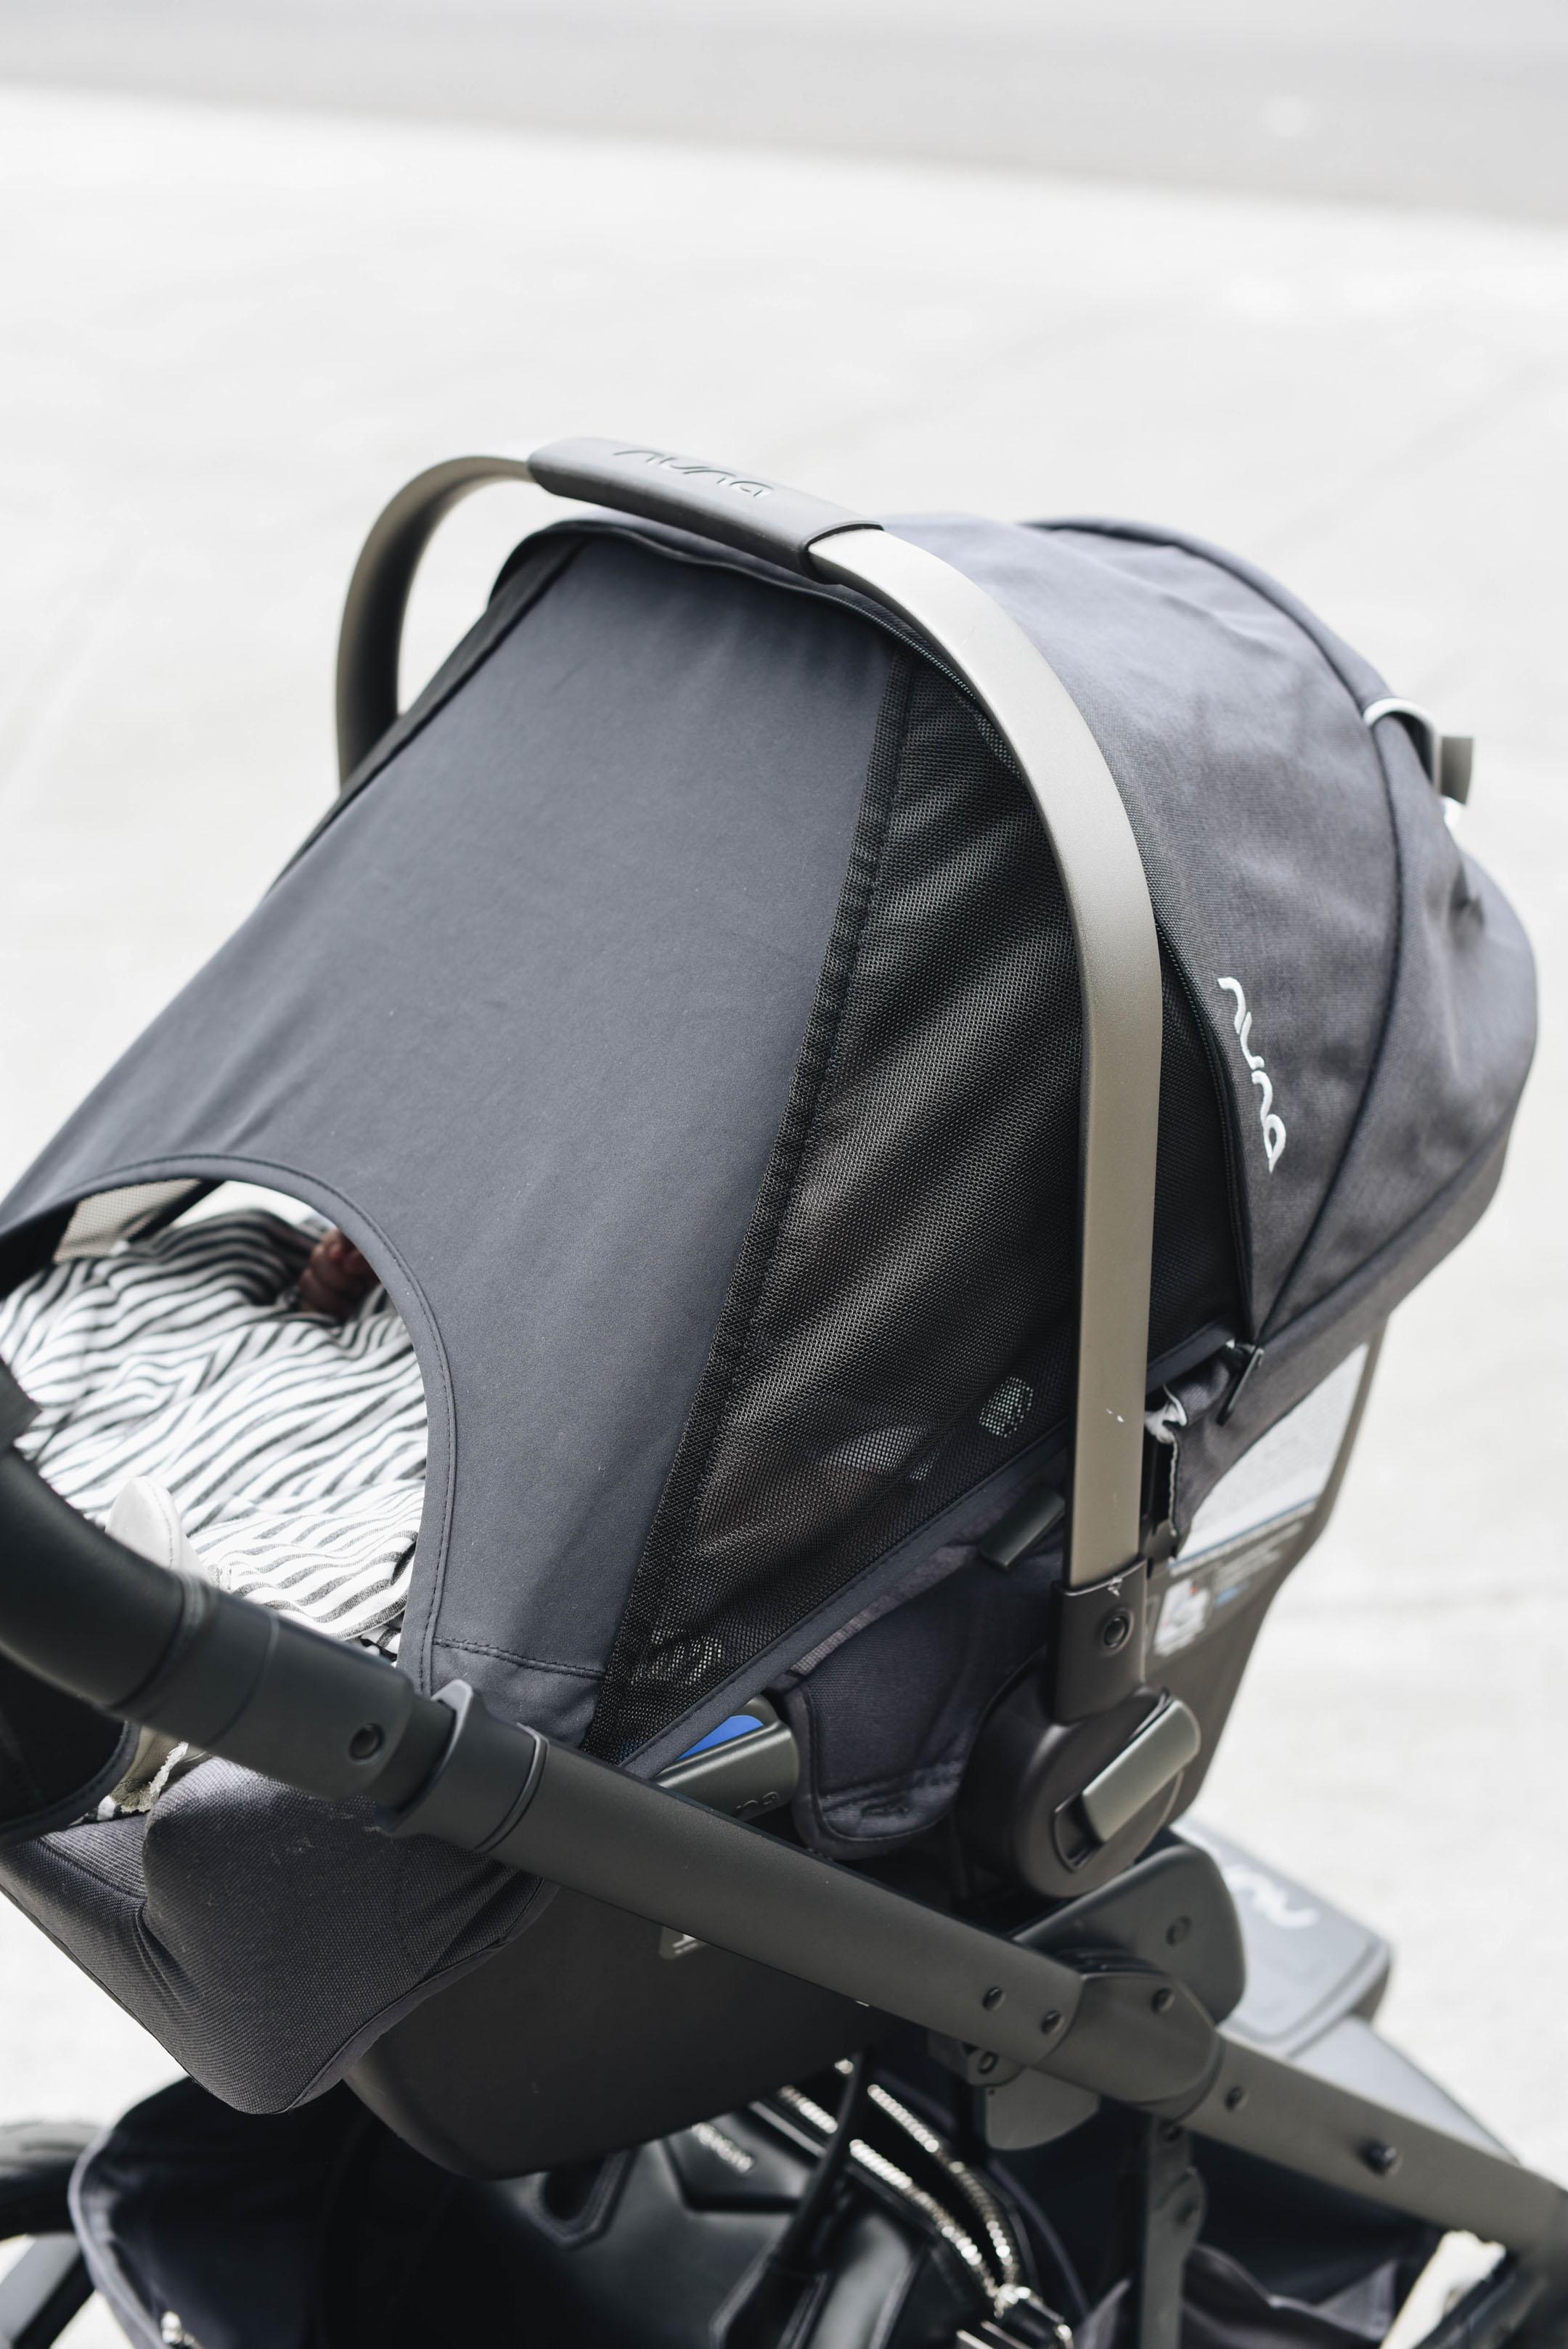 Nuna Stroller Infant Insert